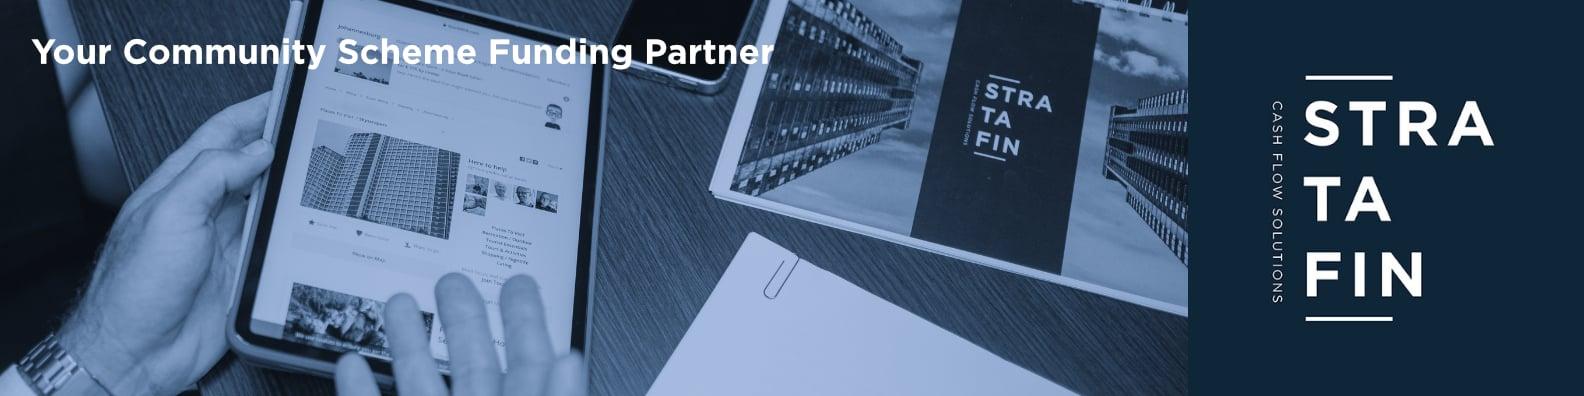 Your Community Scheme Funding Partner